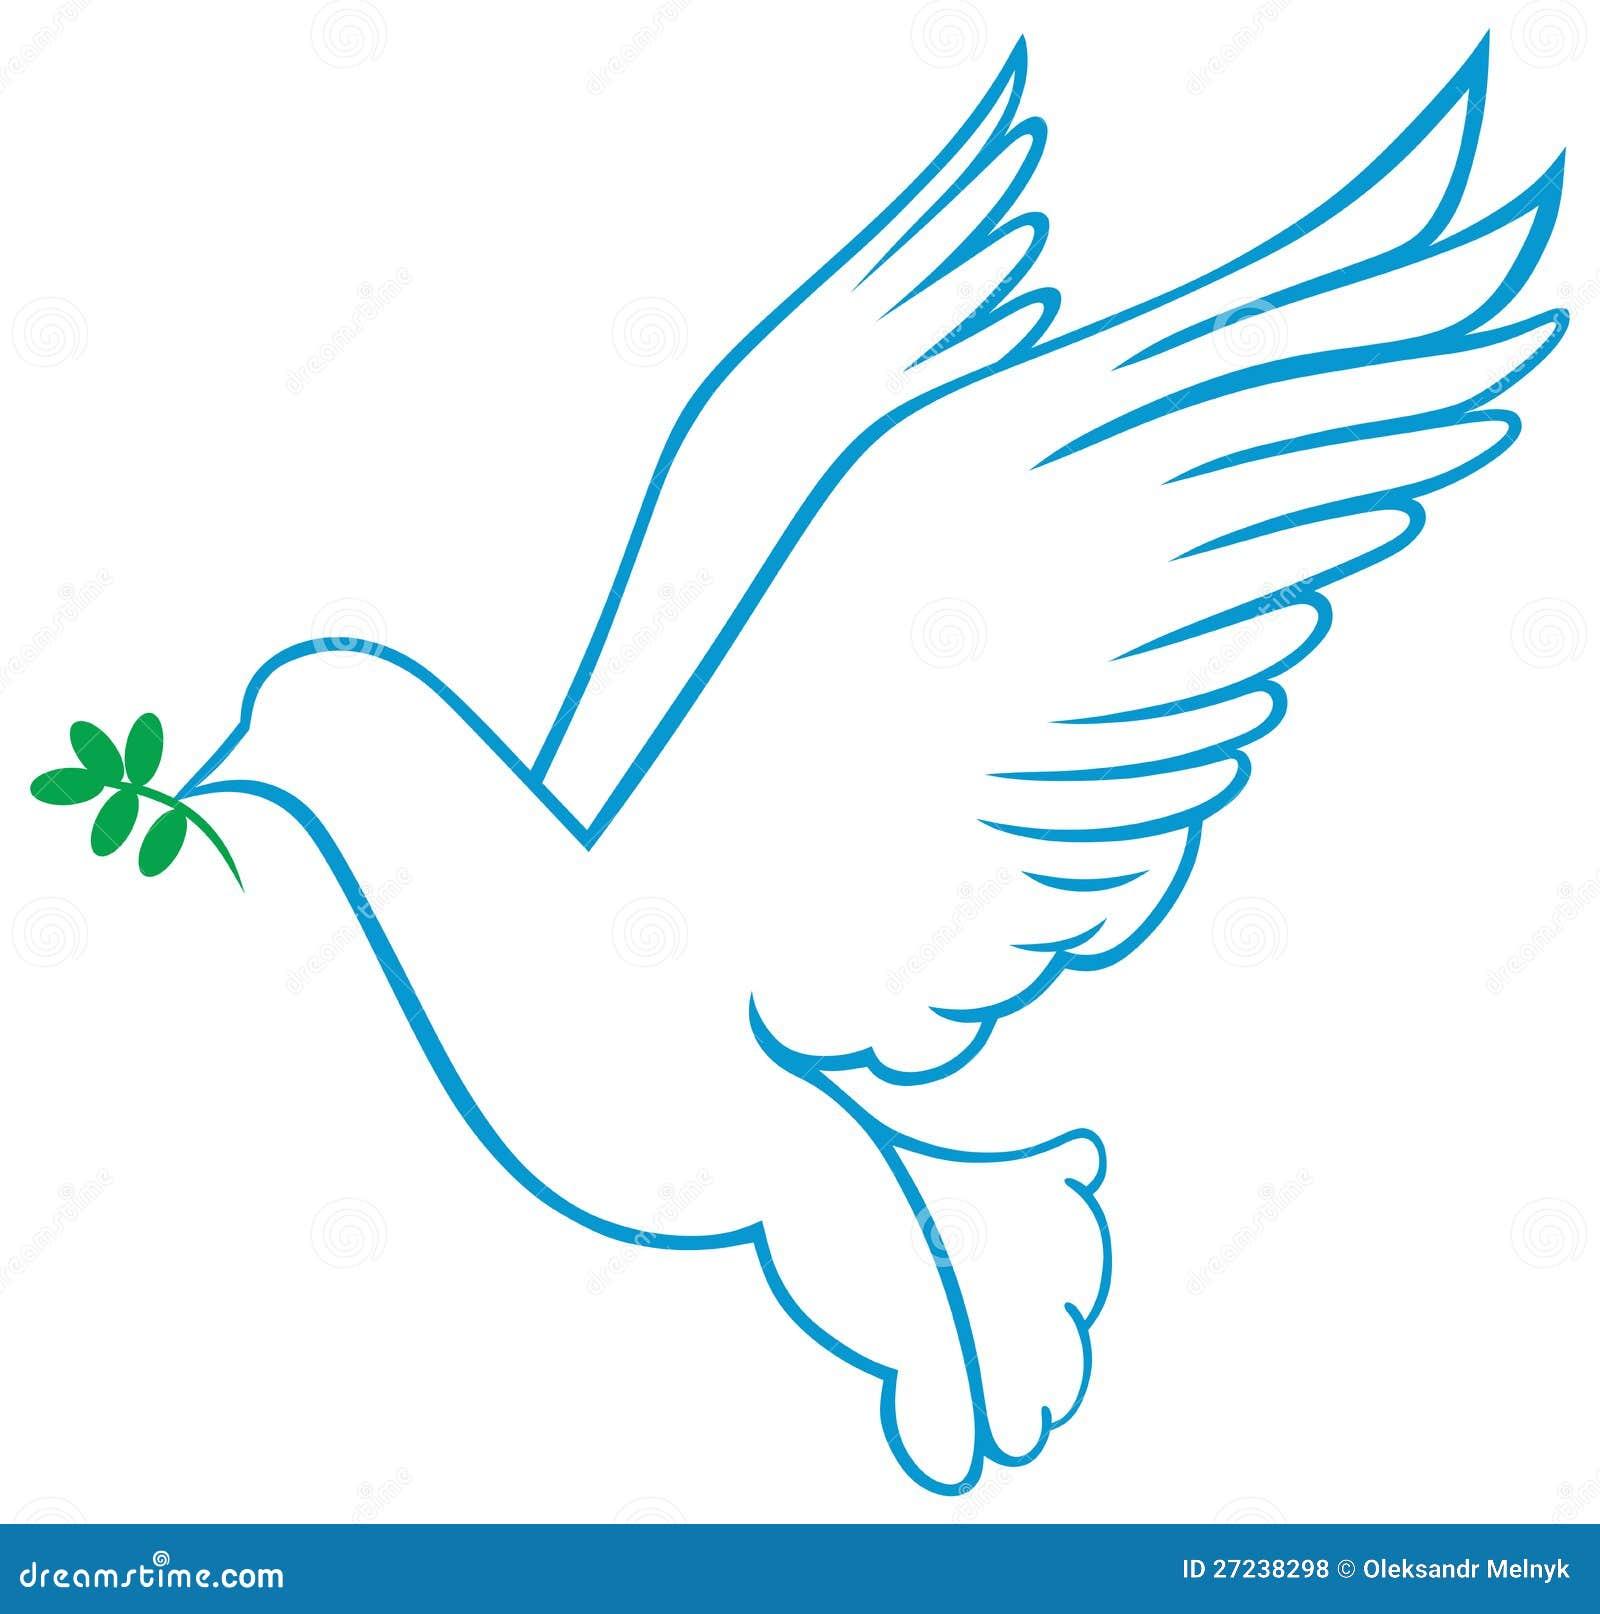 Vector dove symbol stock vector. Illustration of flying